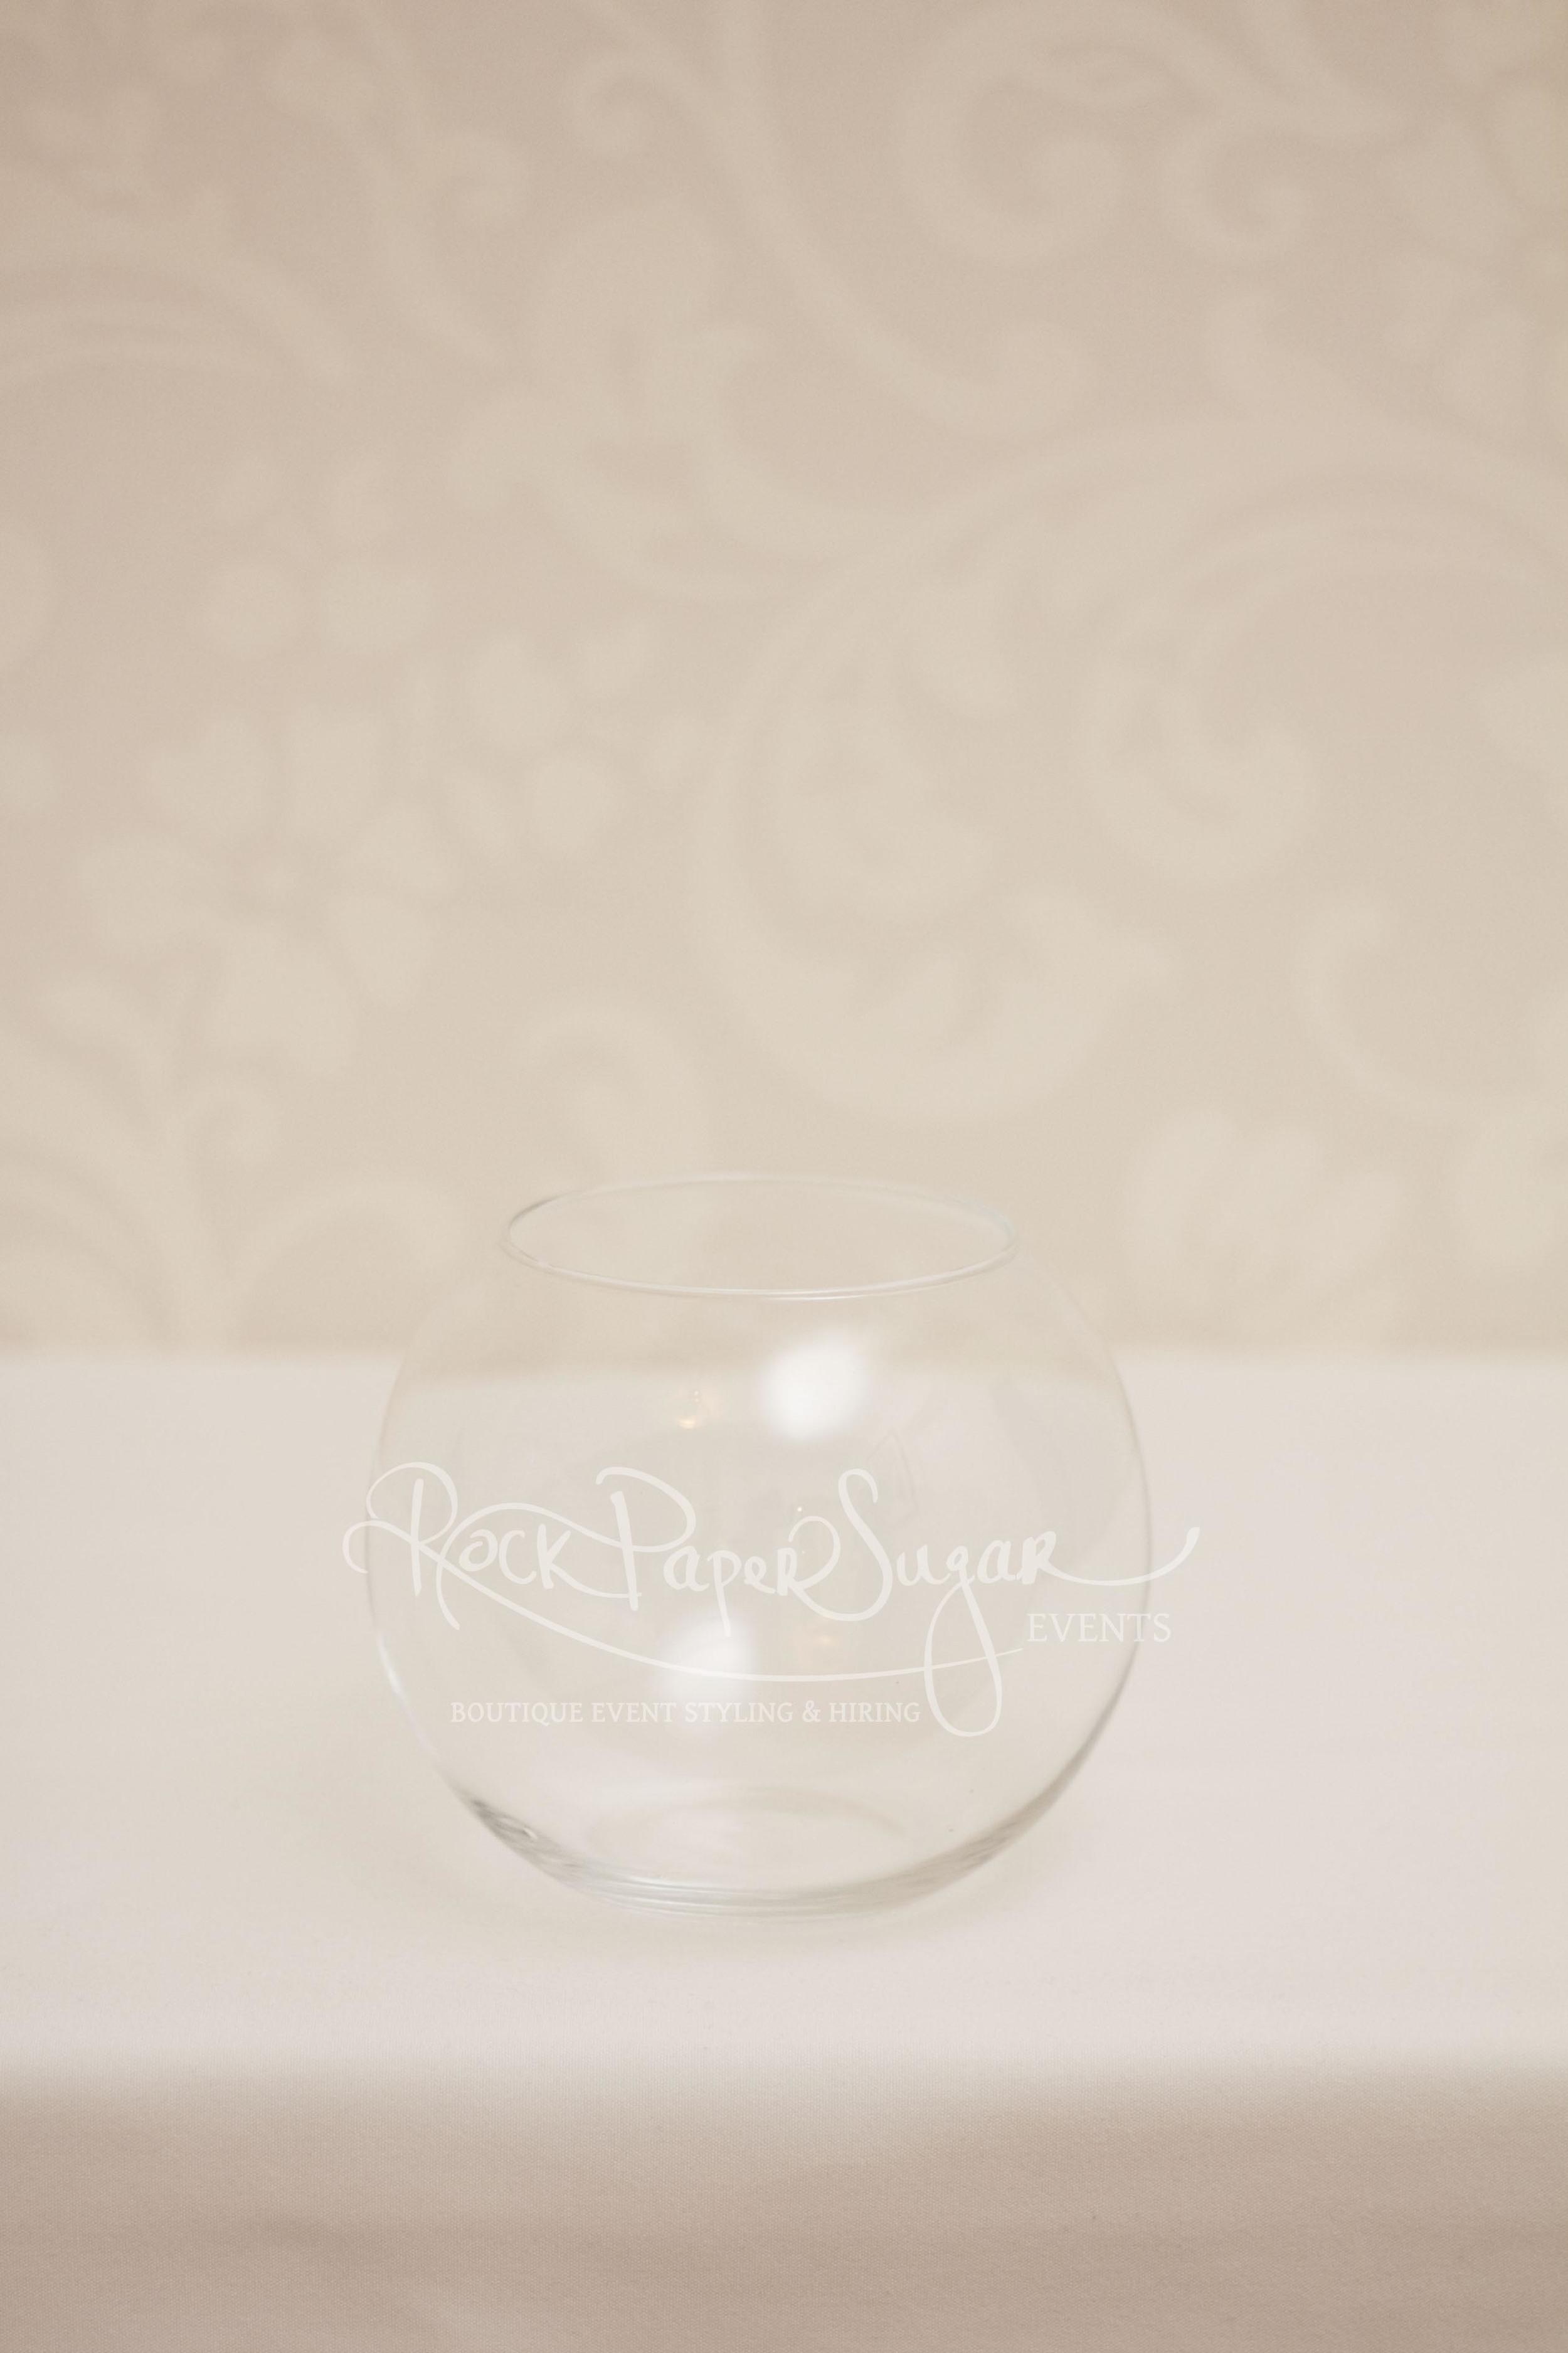 Rock Paper Sugar Events Glassware 012.jpg